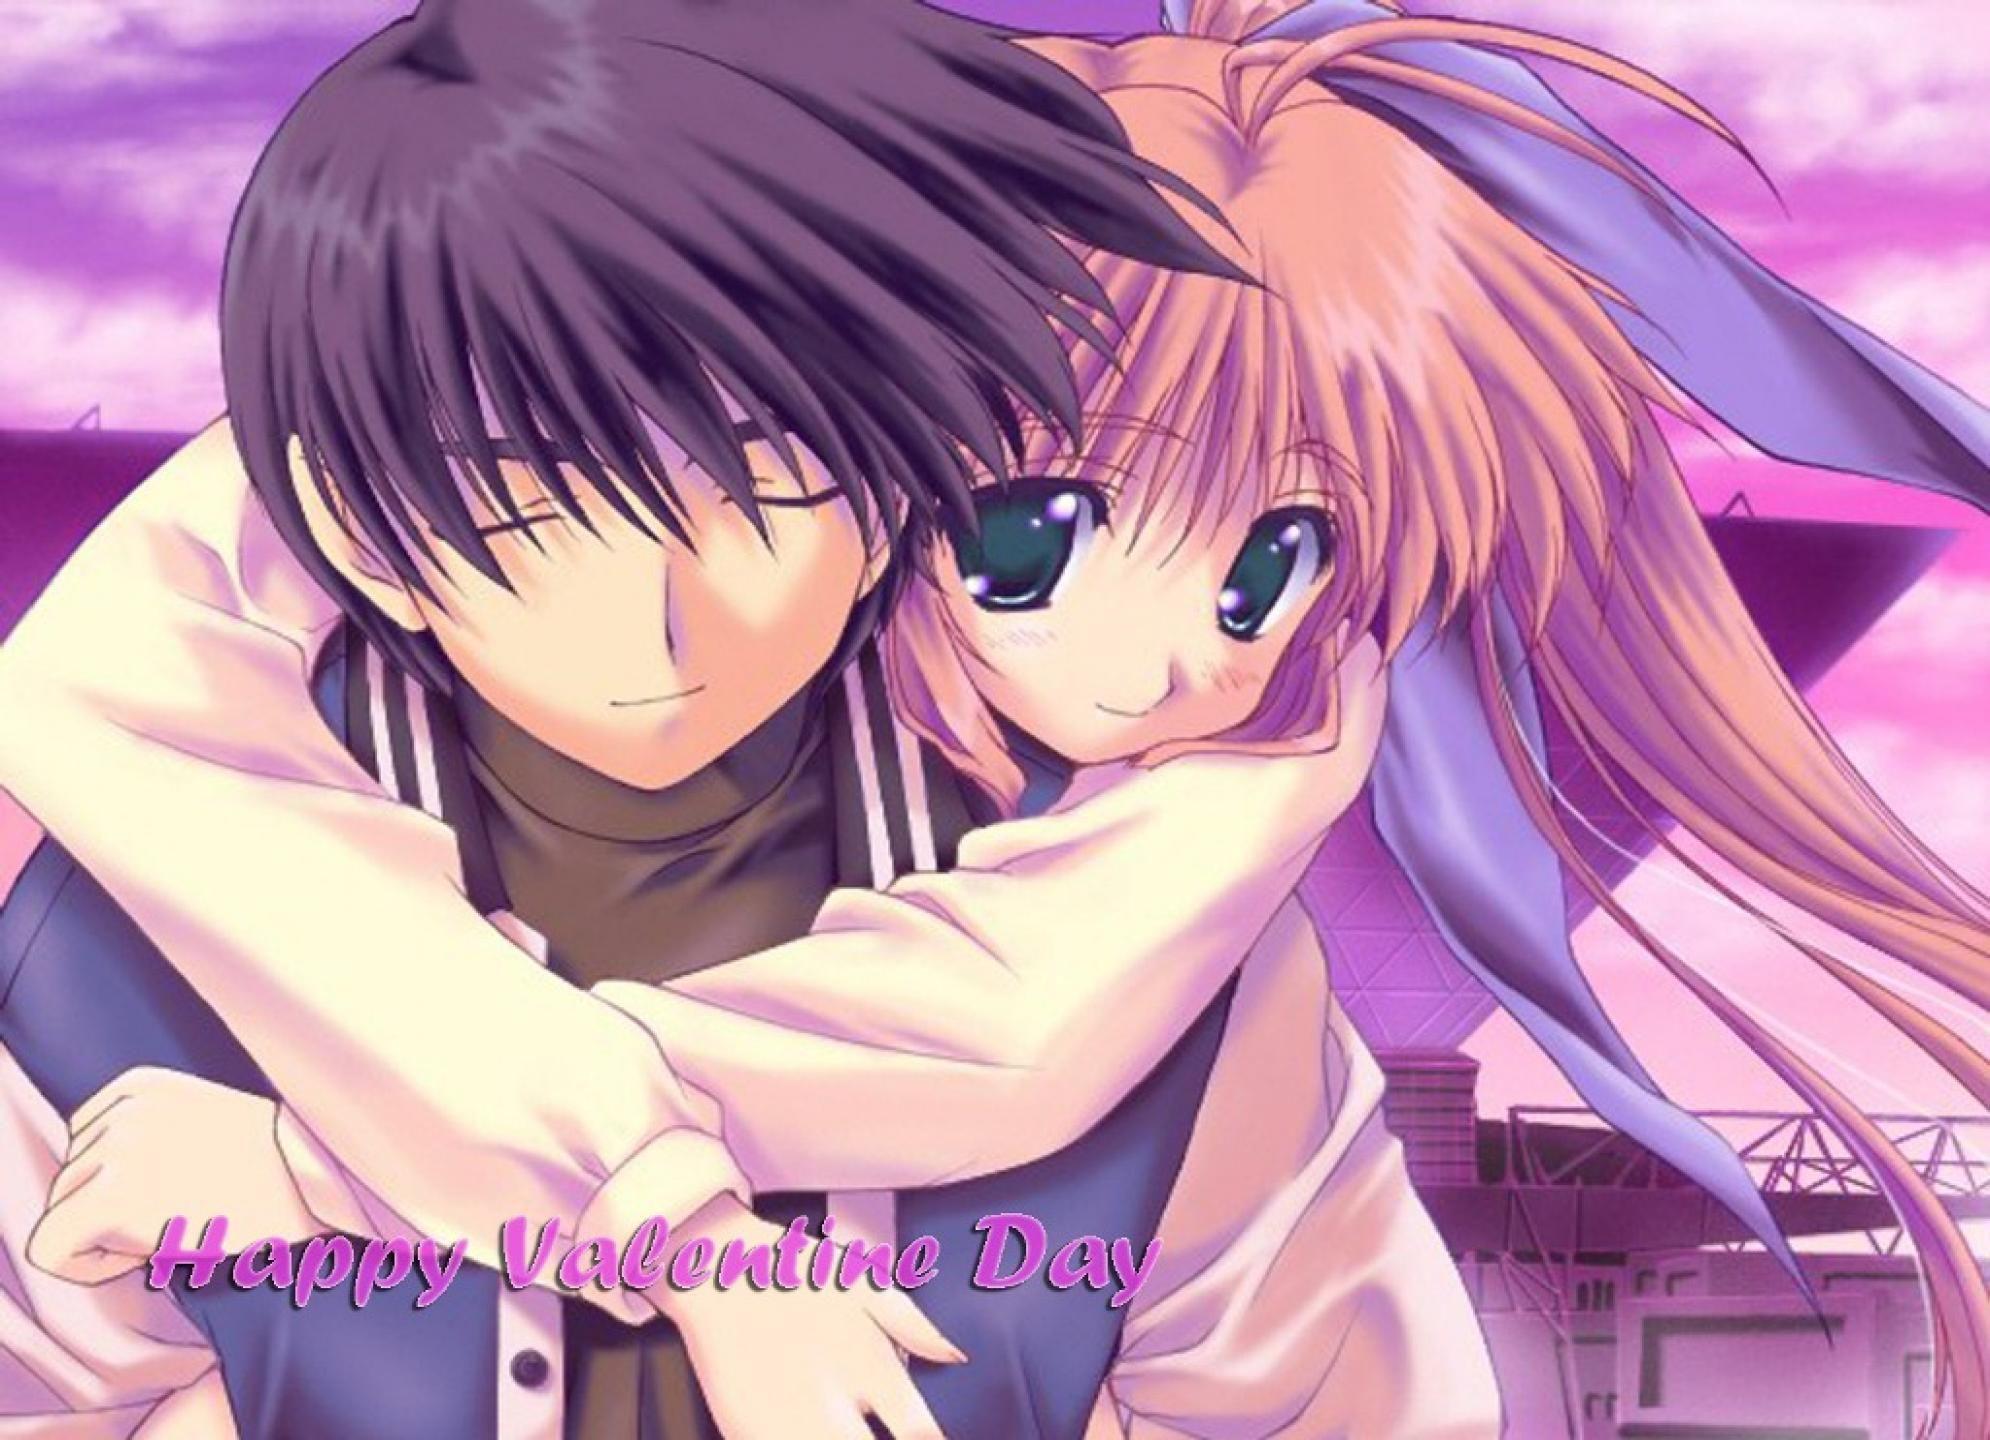 Anime Love Wallpapers Best Romance Anime Anime Romance Anime Love